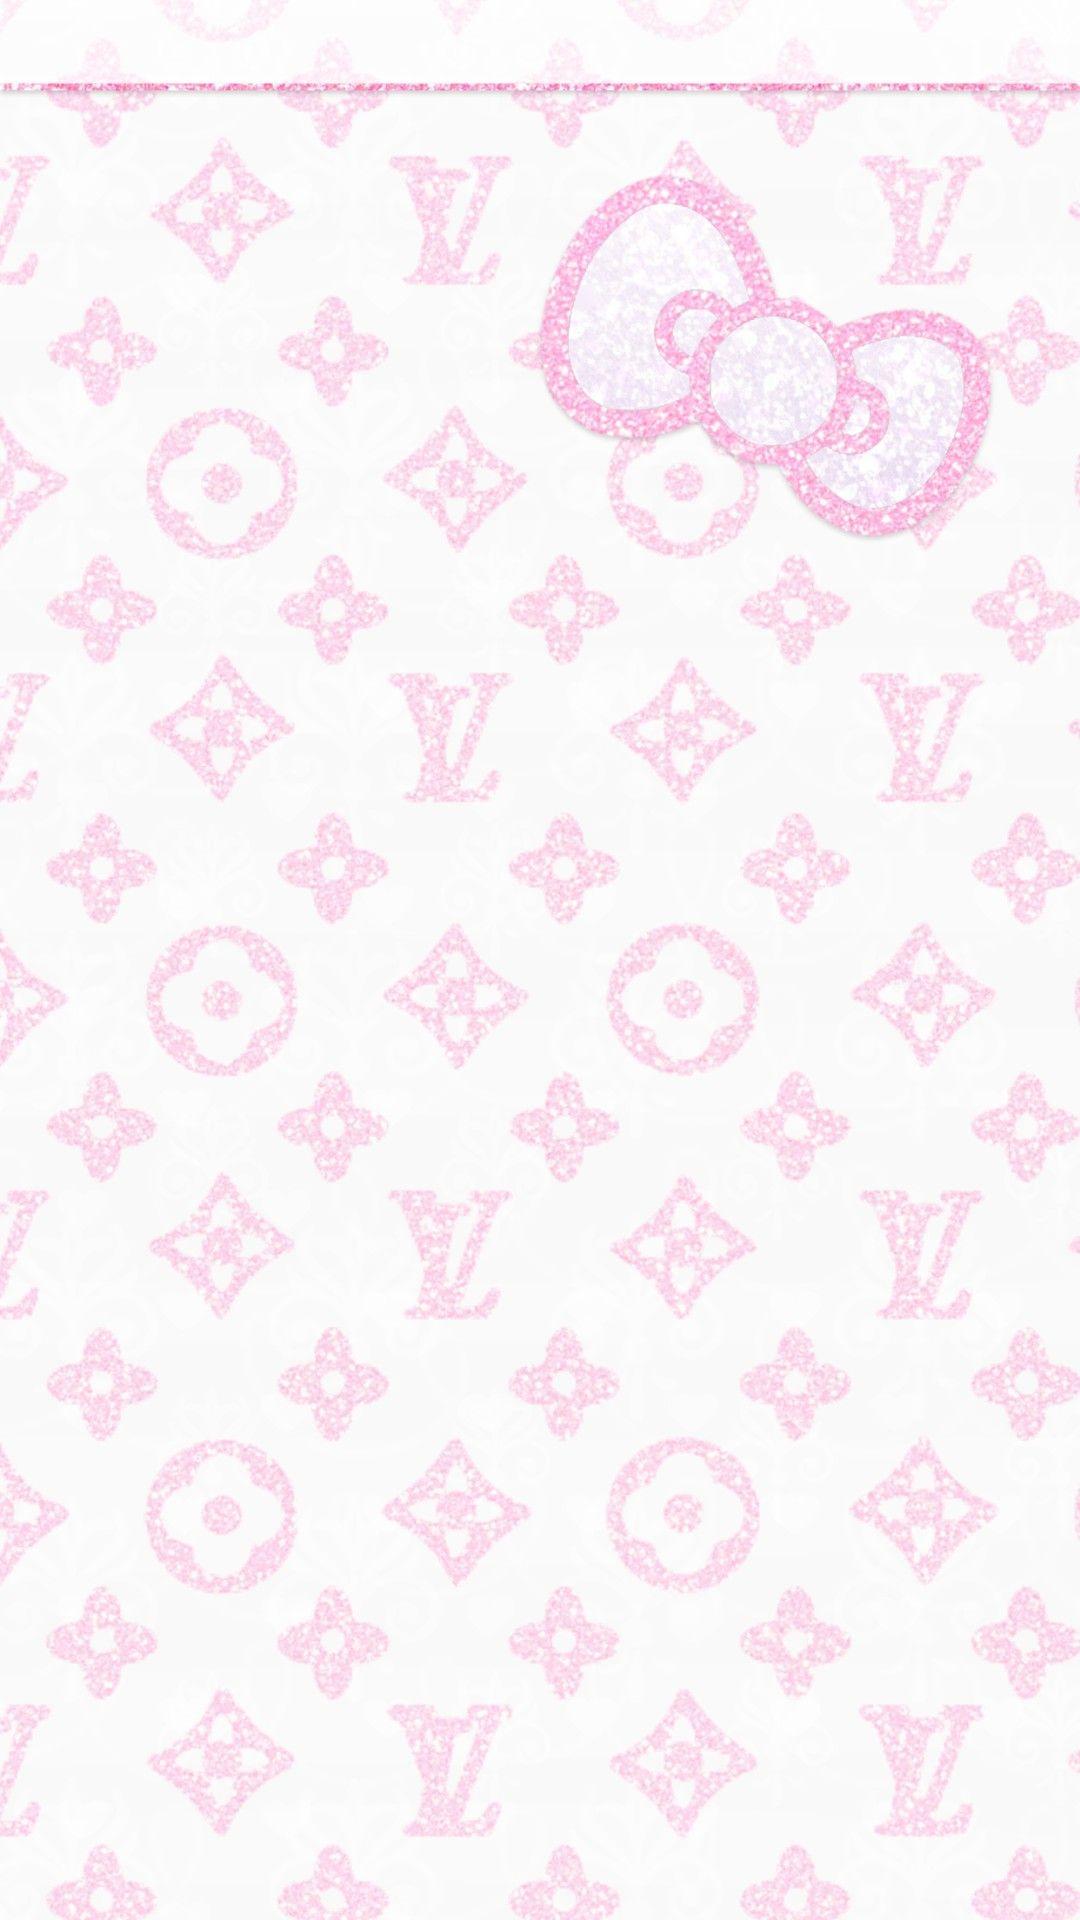 Hello Kitty Bow Tie Kate Spade Wallpaper Hello Kitty Iphone